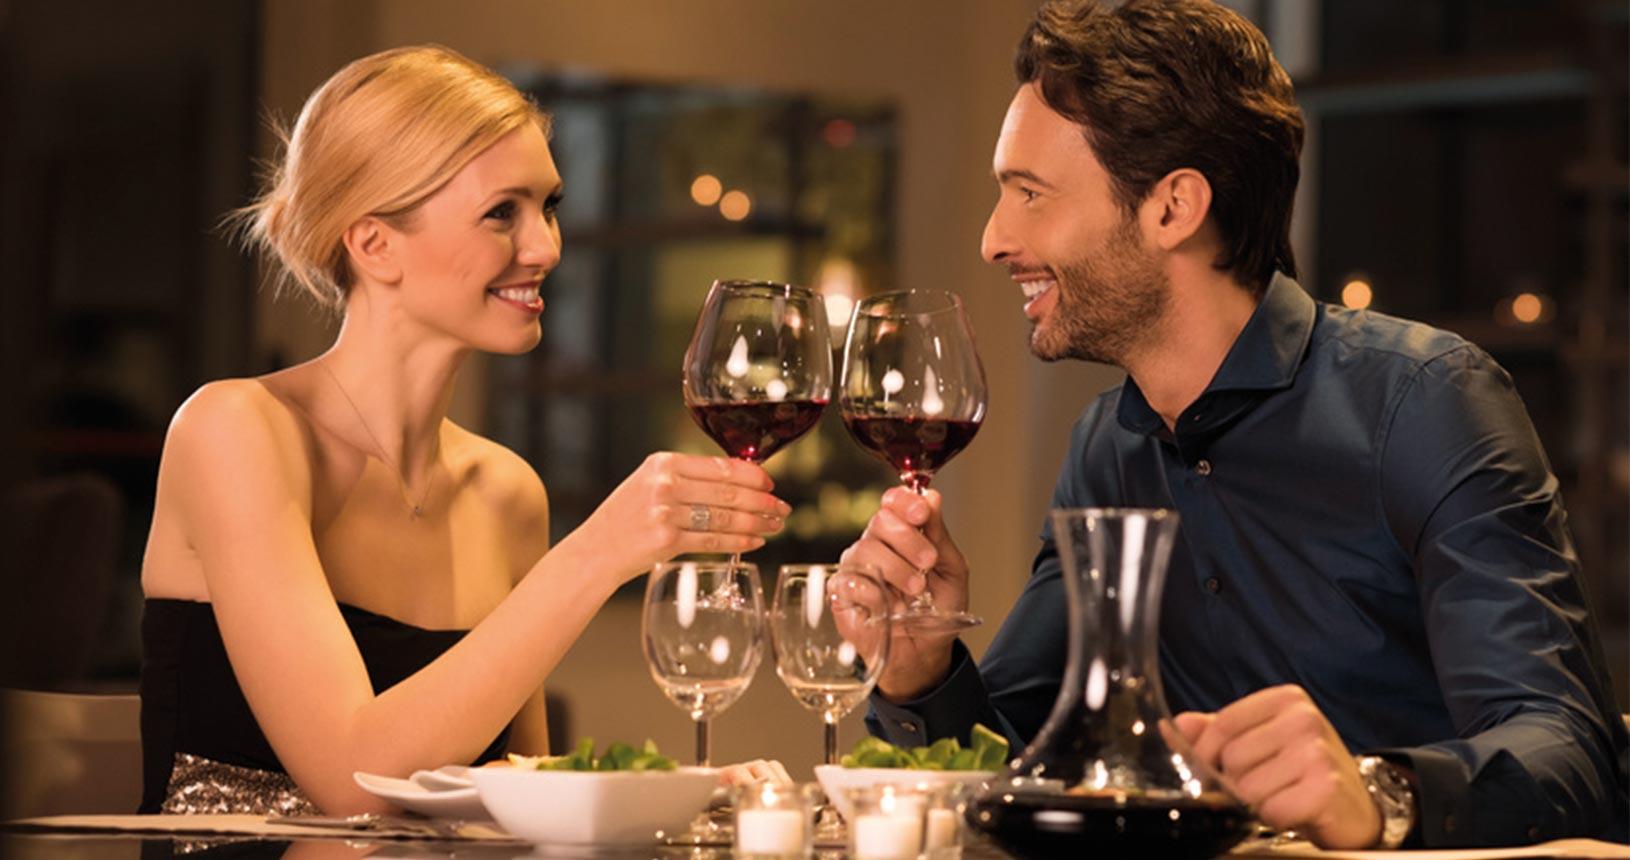 Paar beim Dinner | Urlaub für Paare | © Rido - fotolia.com